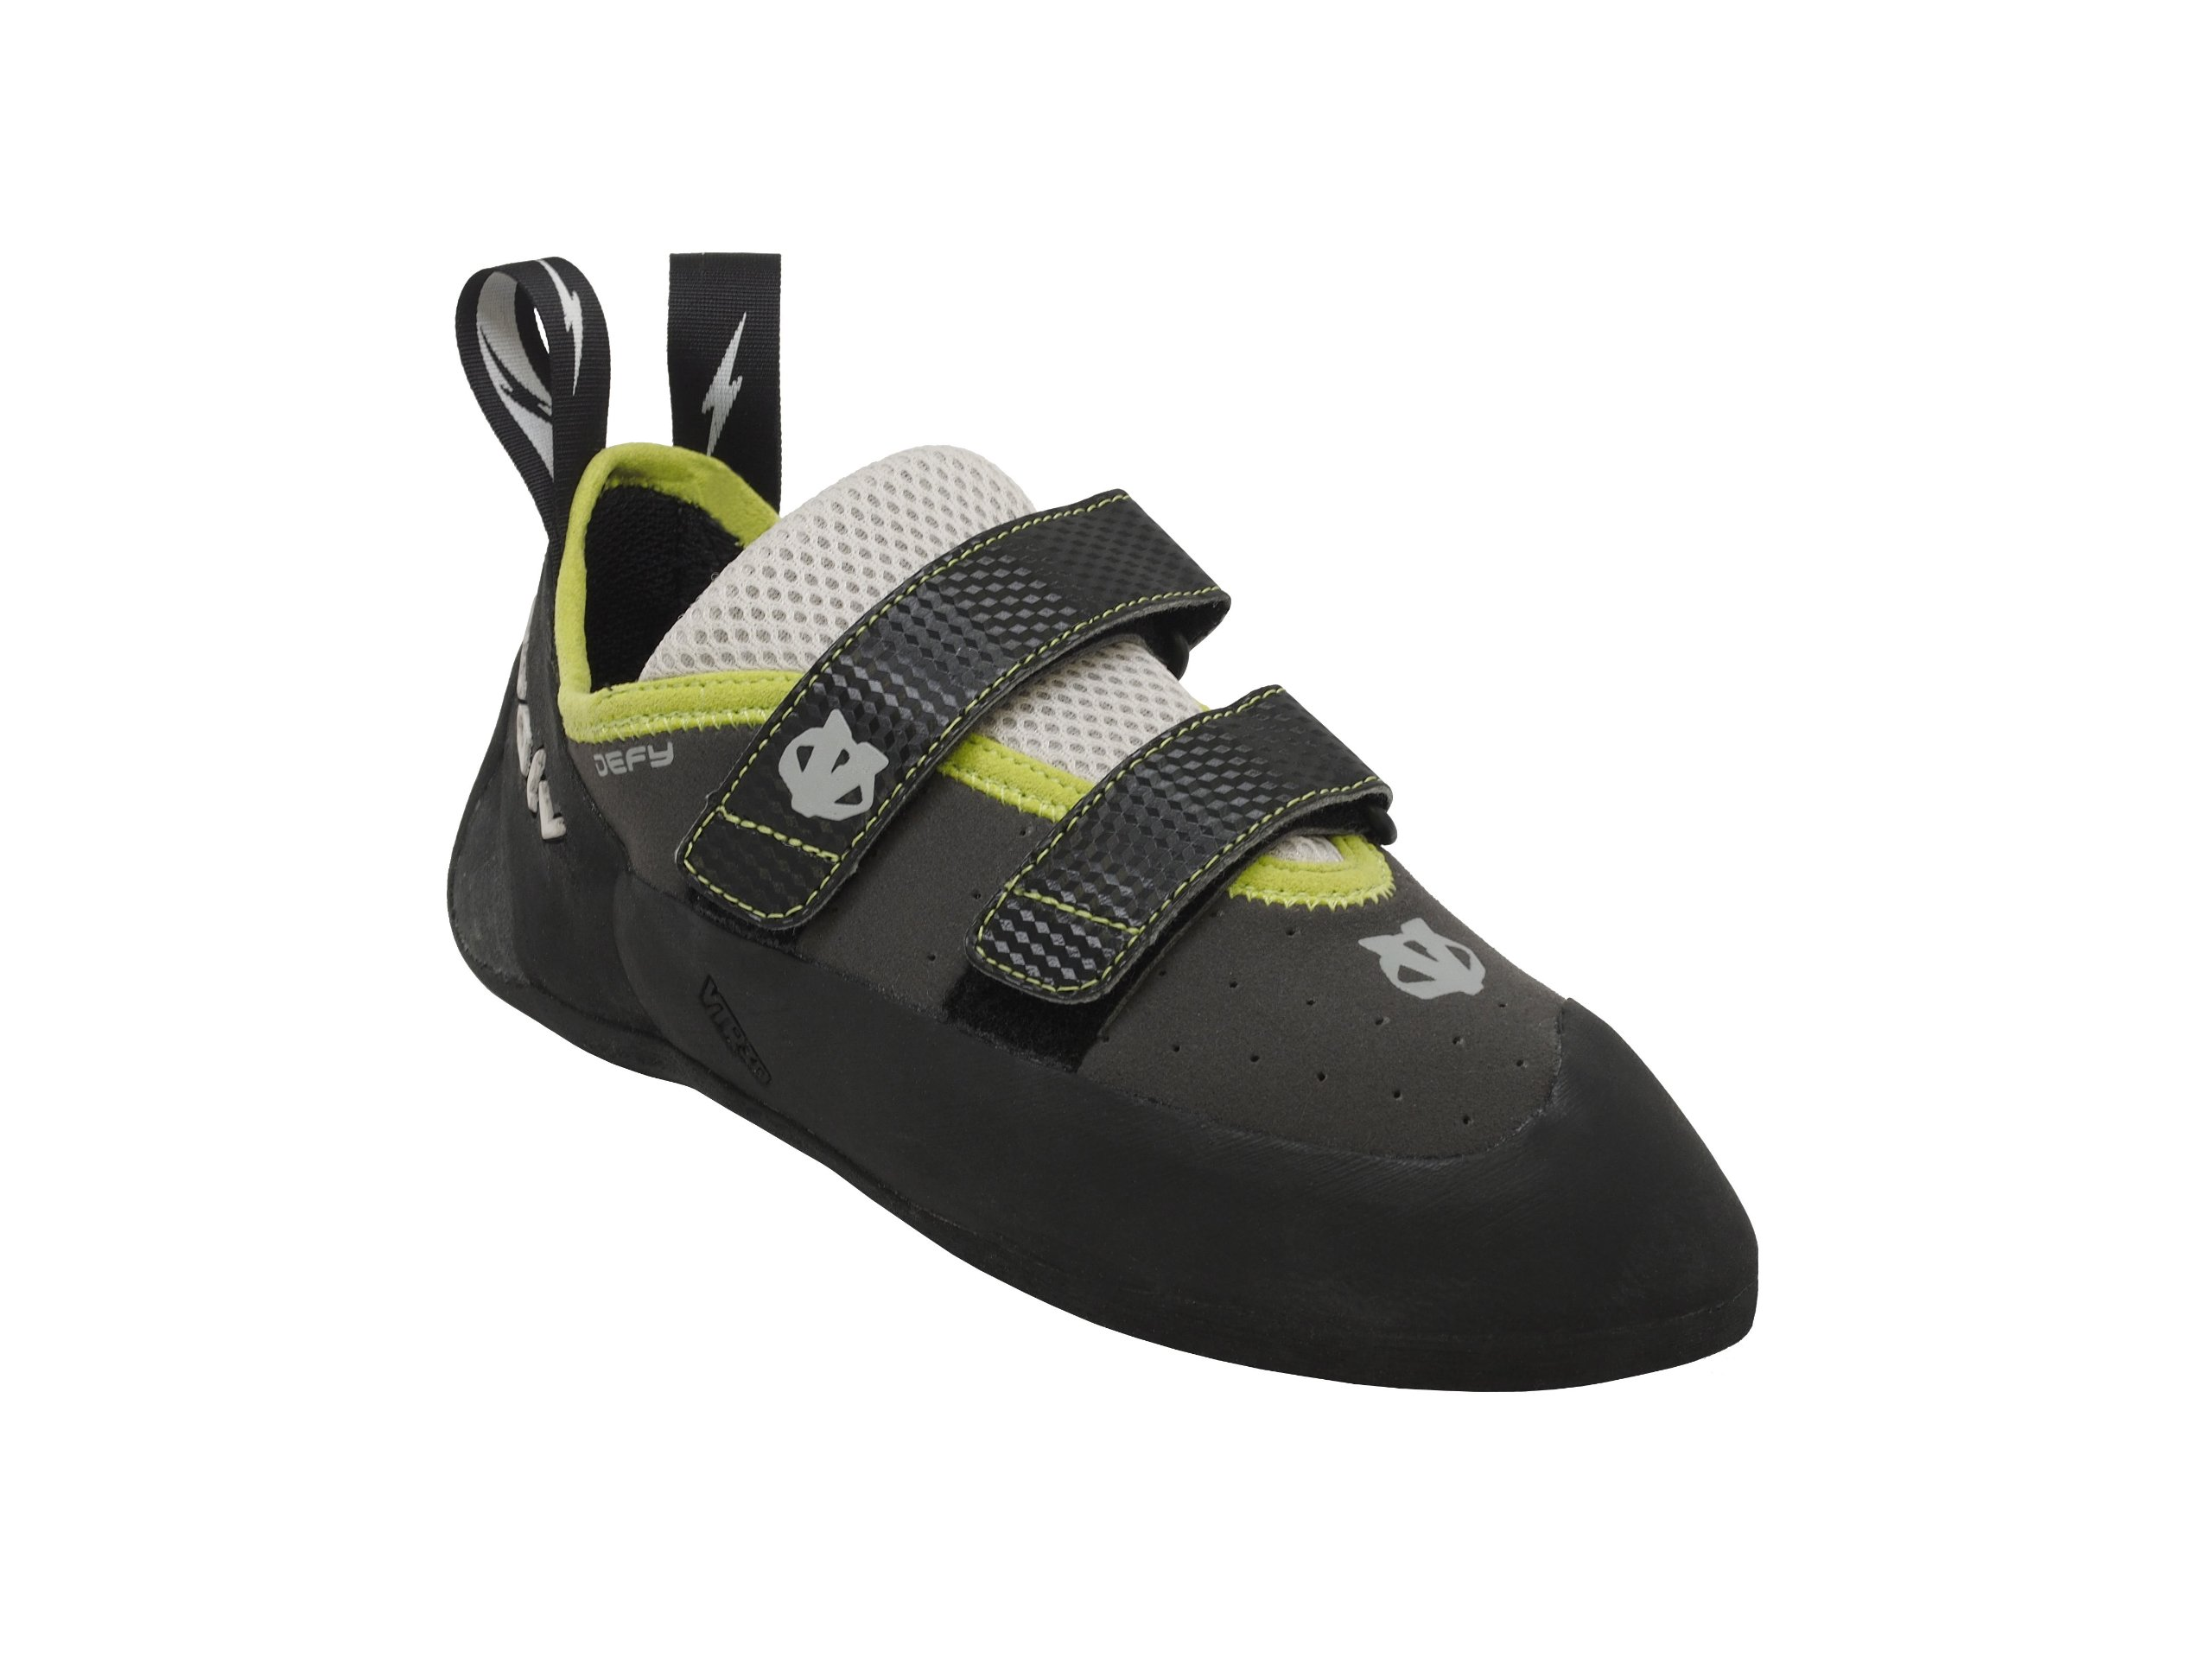 Evolv Defy Climbing Shoe - Charcoal 2